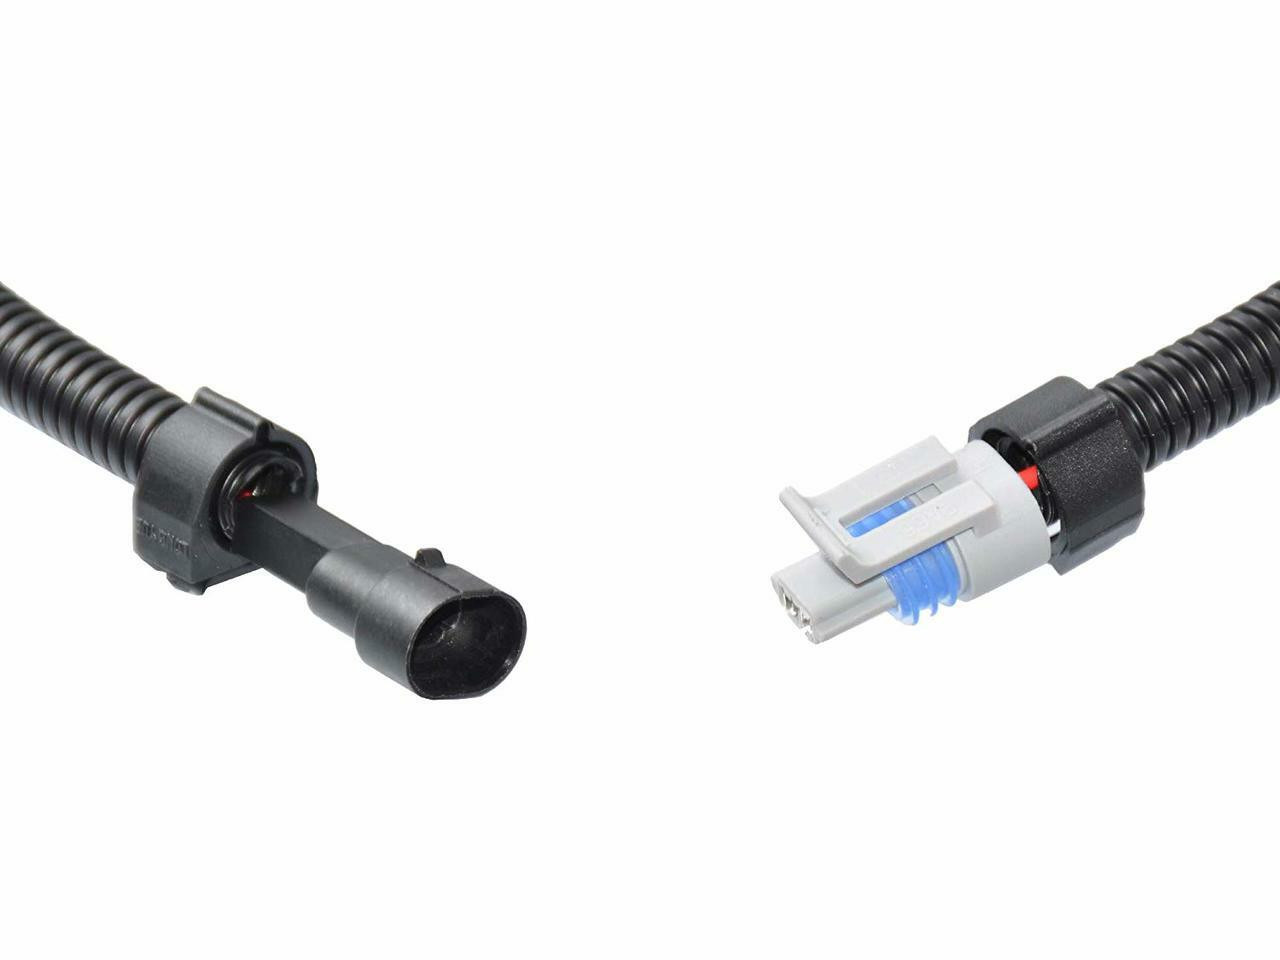 hight resolution of intake air temp iat mat sensor wire harness extension 36 fits gm ls1 lt1